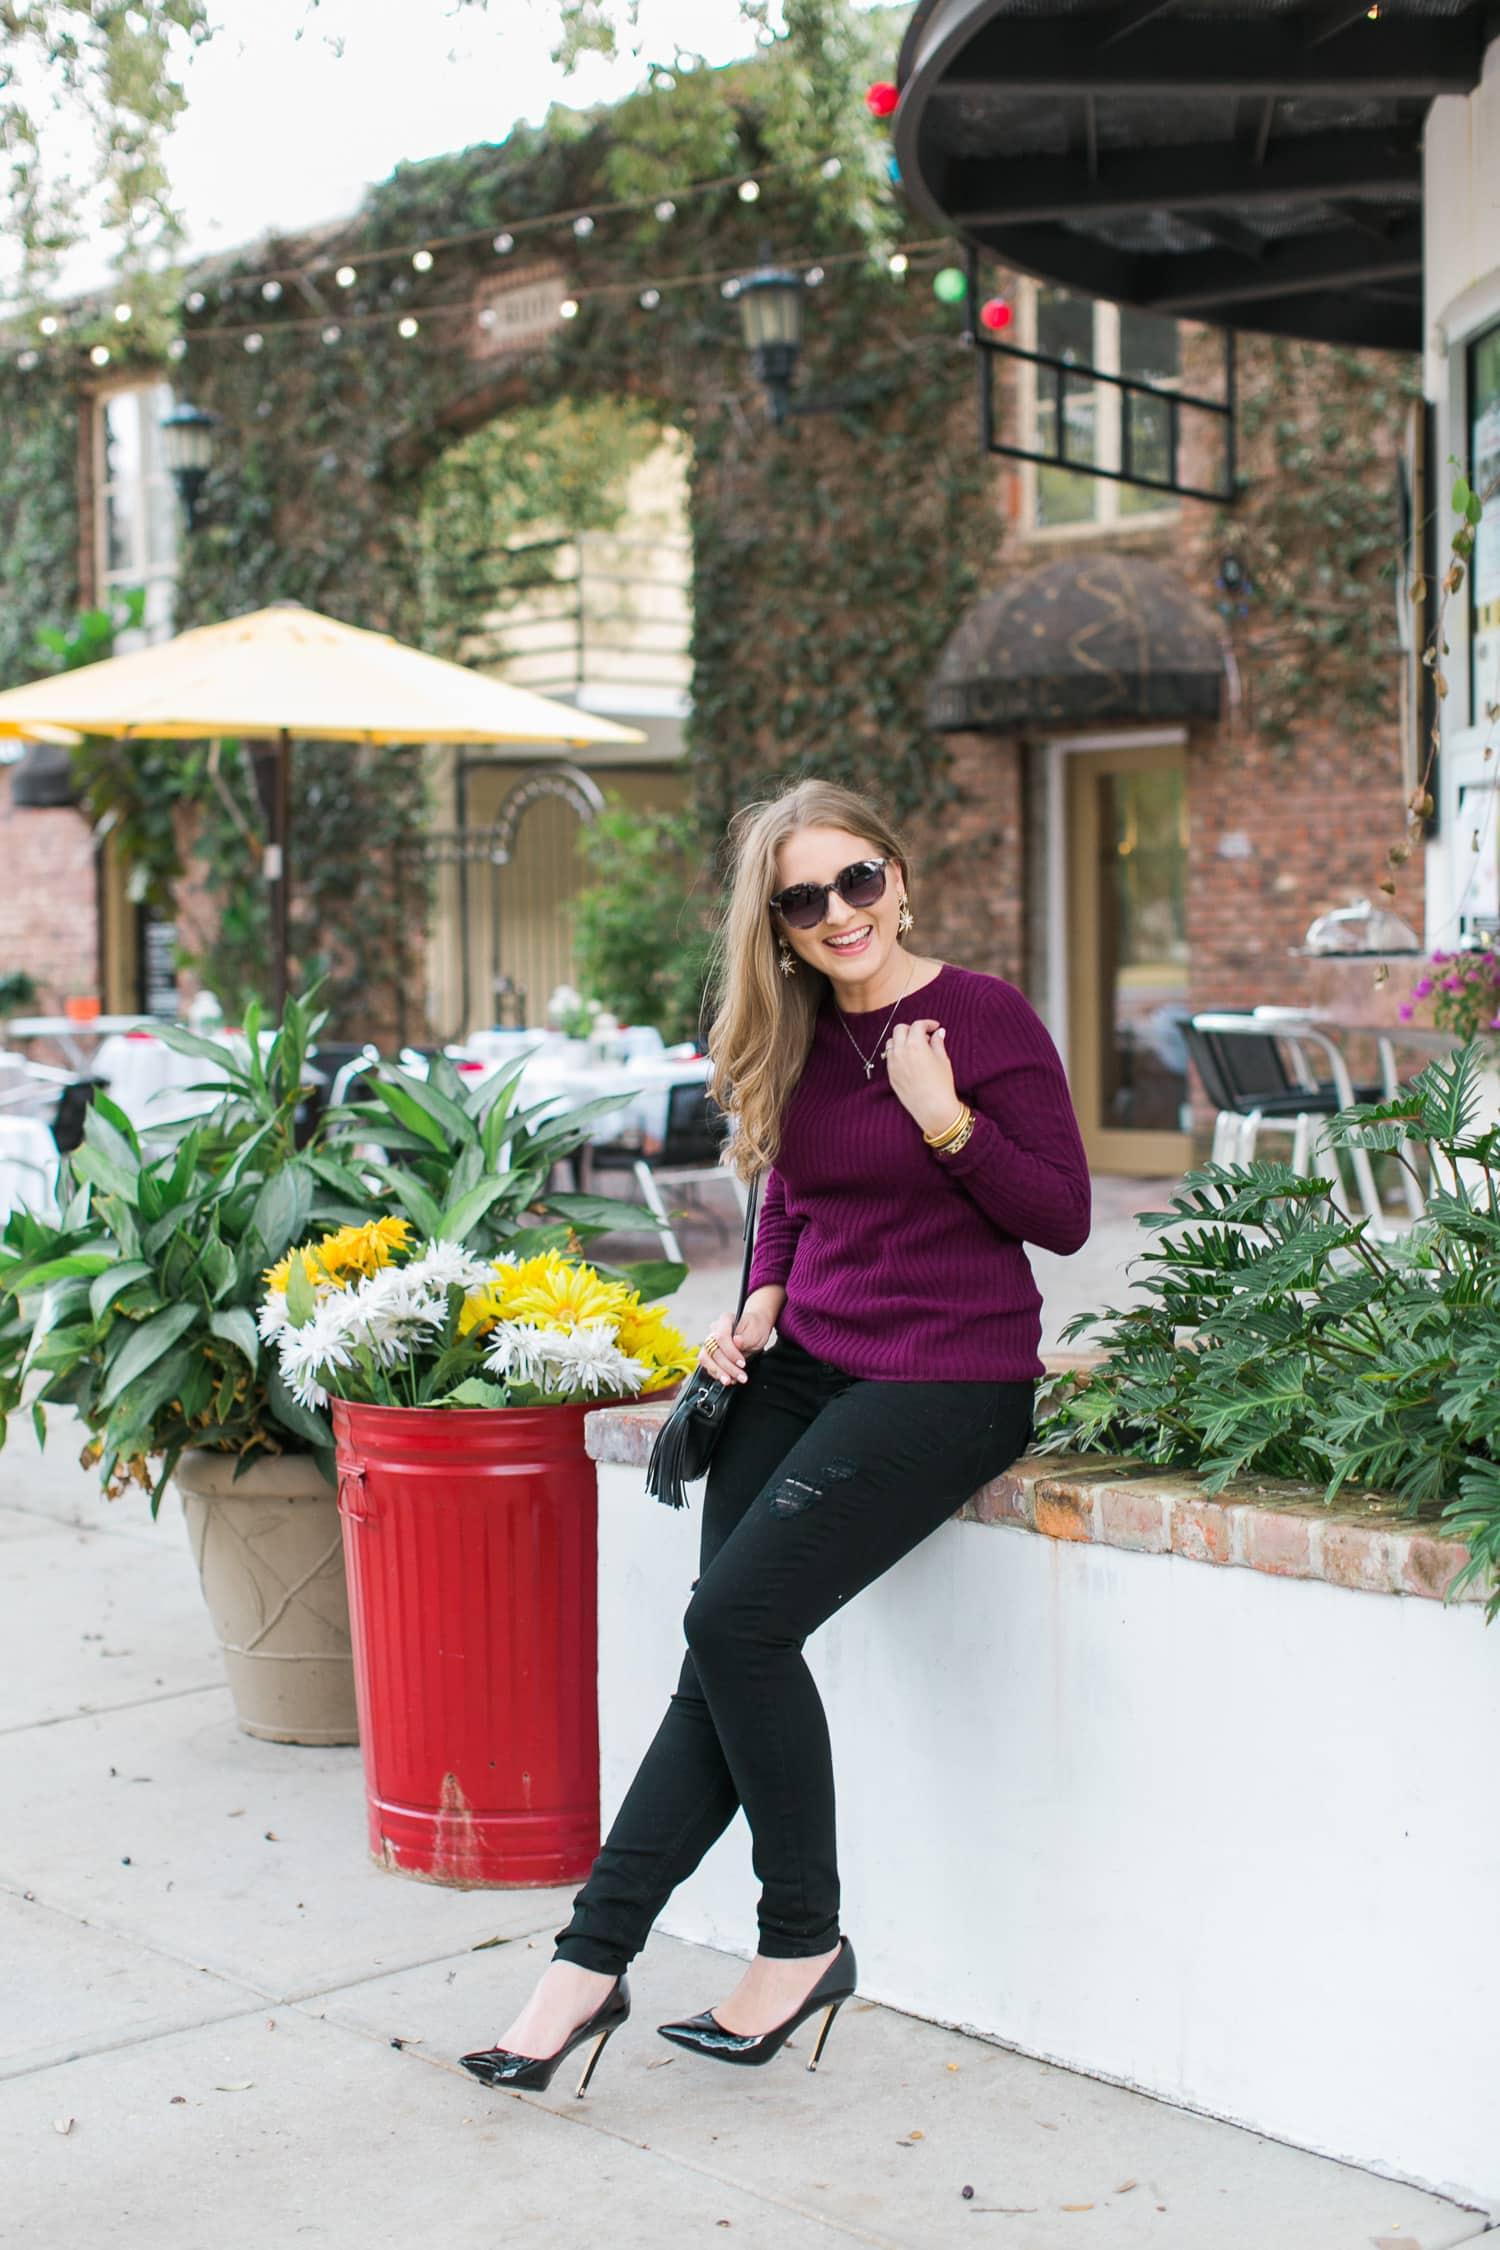 black-ripped-jeans-retro-round-sunglasses-burgundy-cashmere-sweater-black-pointy-toe-pumps-tassel-handbag-ashley-brooke-nicholas-047